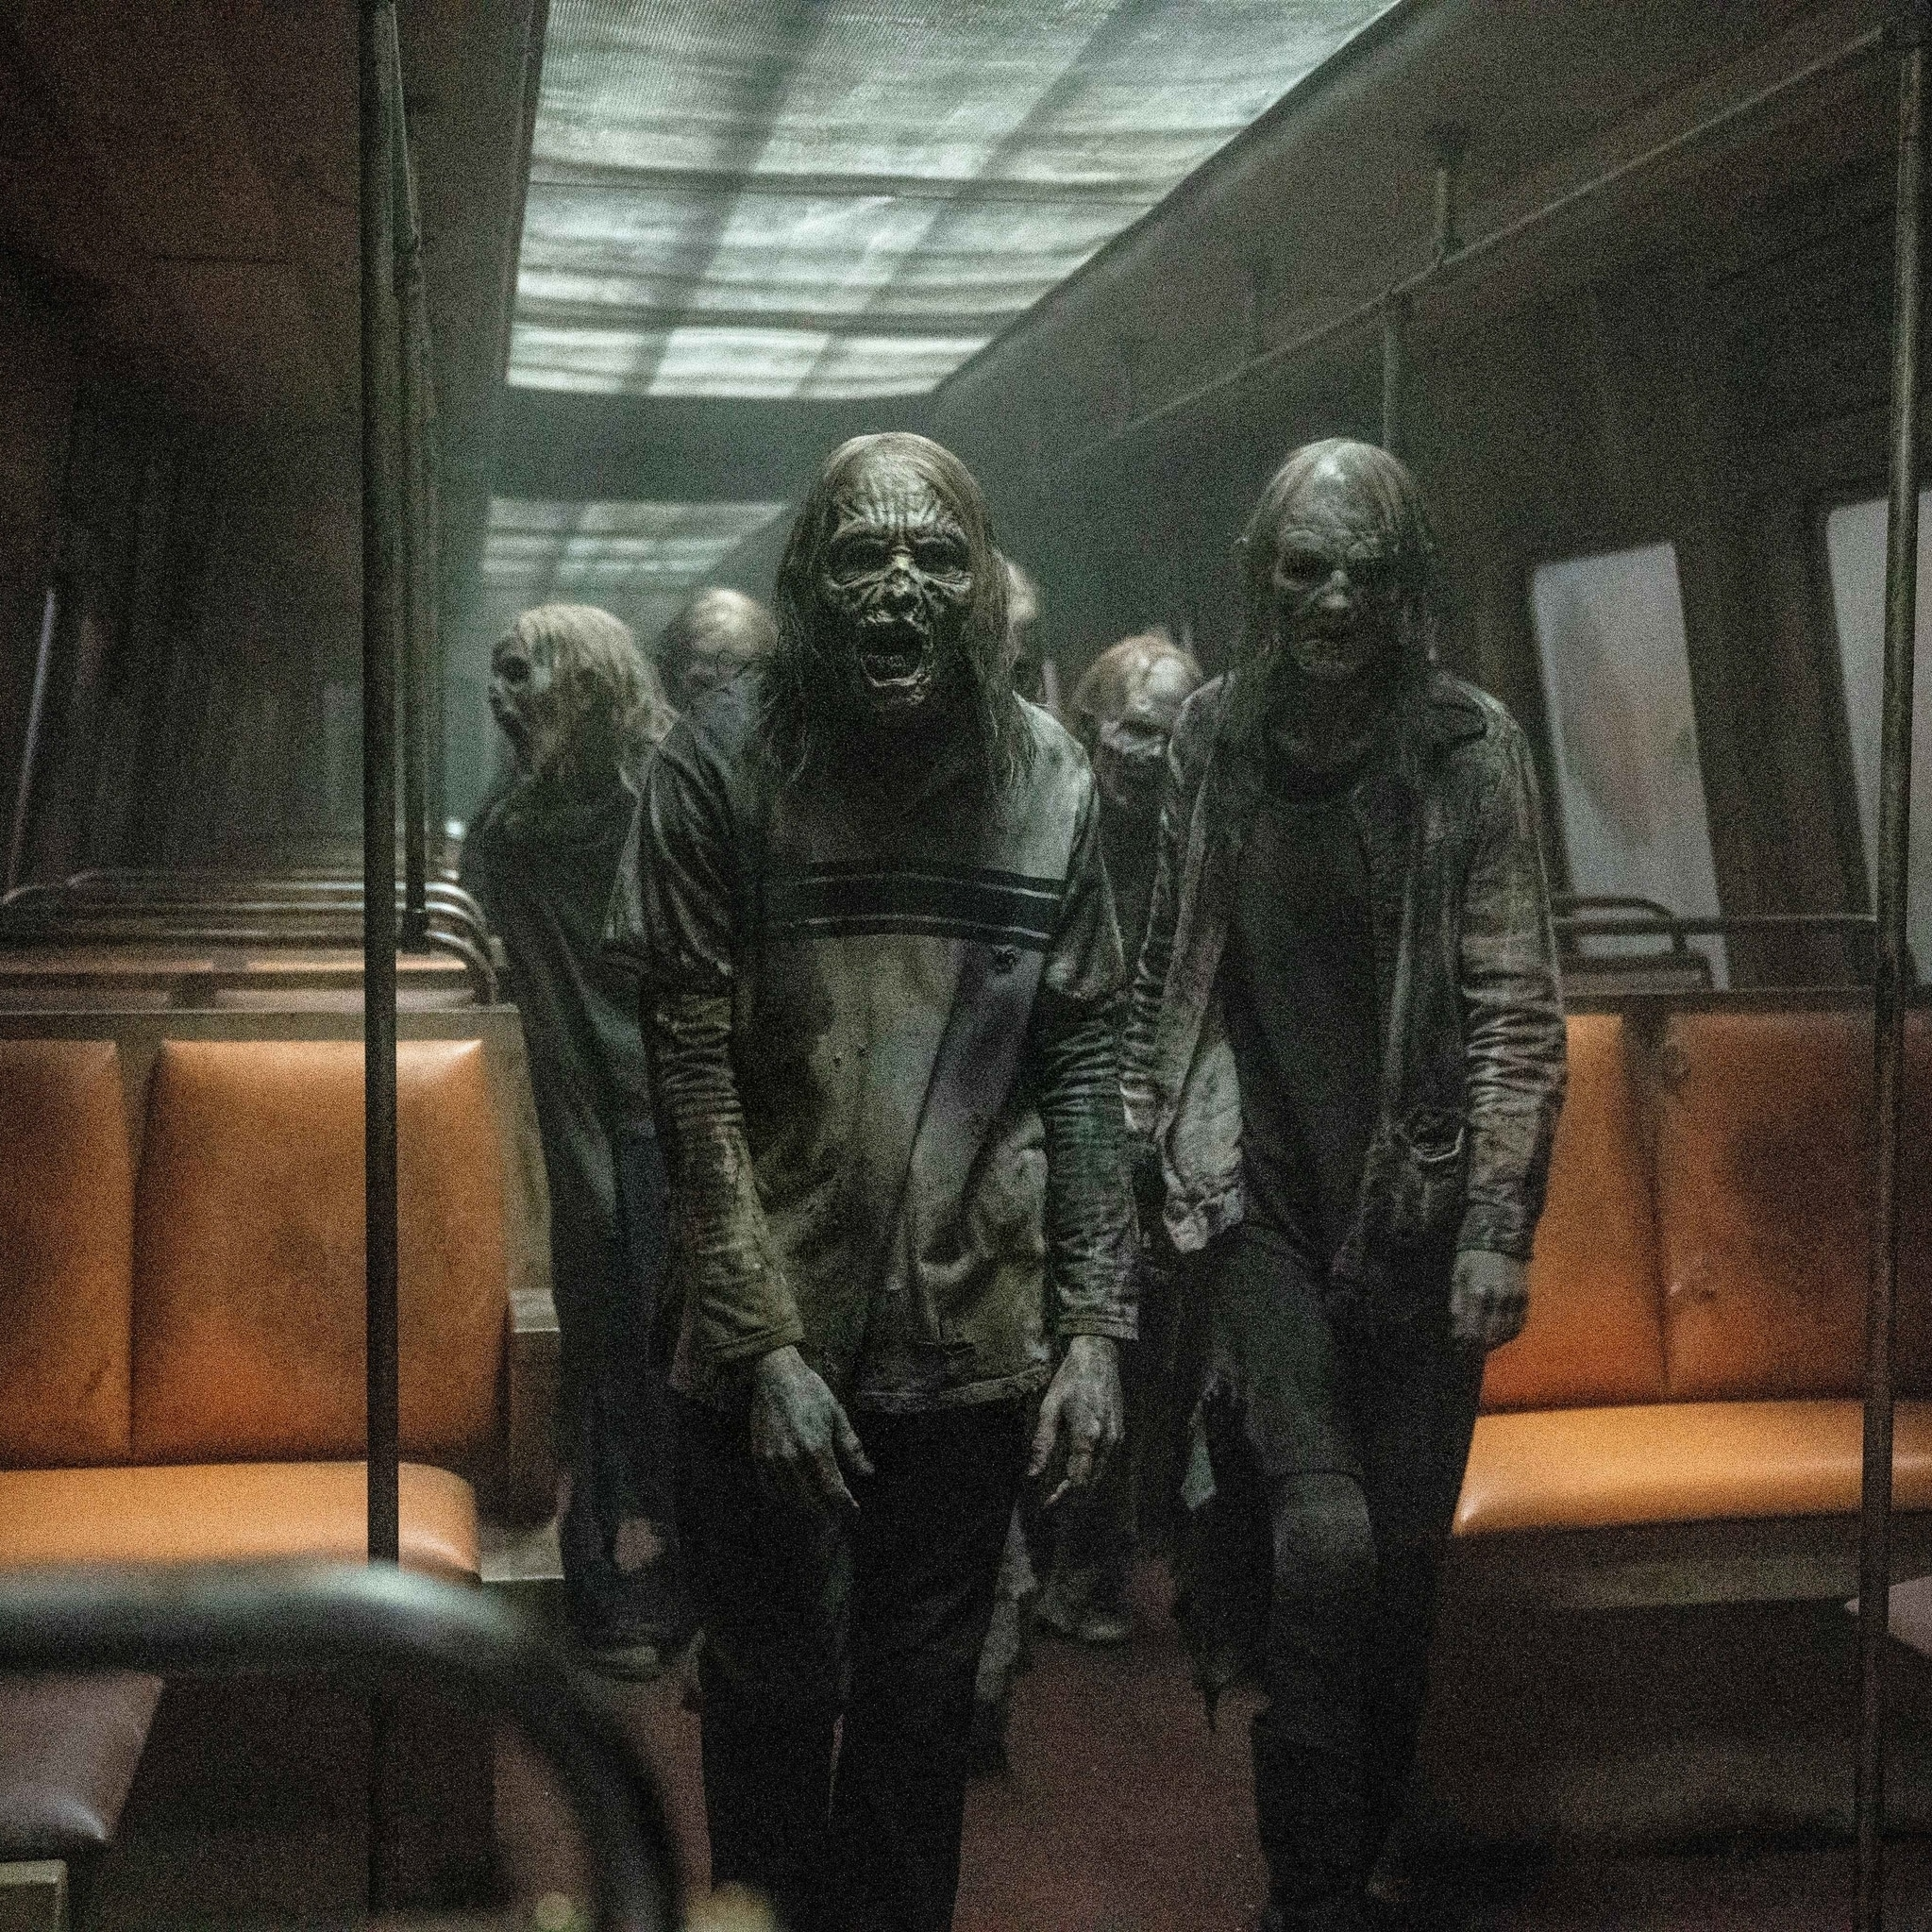 Anteriormente em… The Walking Dead